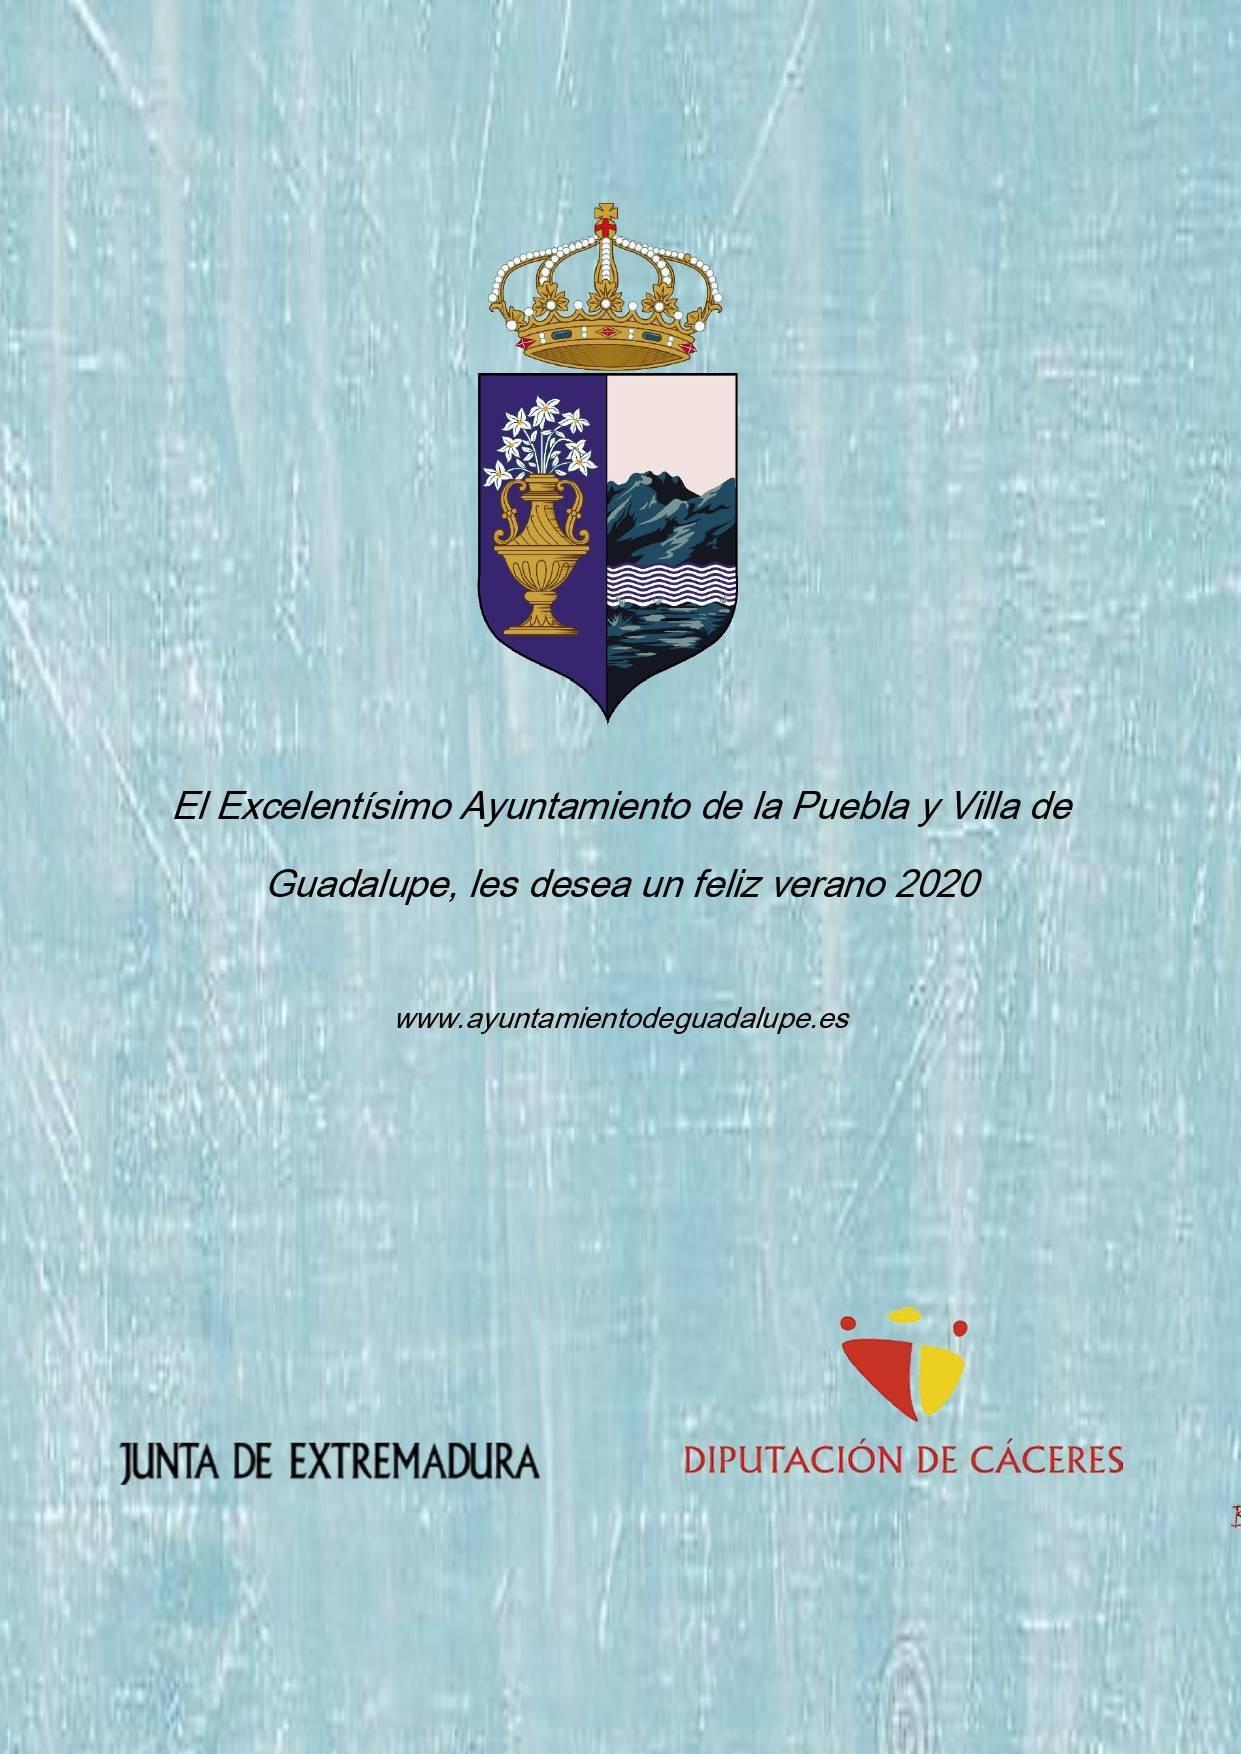 Programa cultural de verano 2020 - Guadalupe (Cáceres) 11